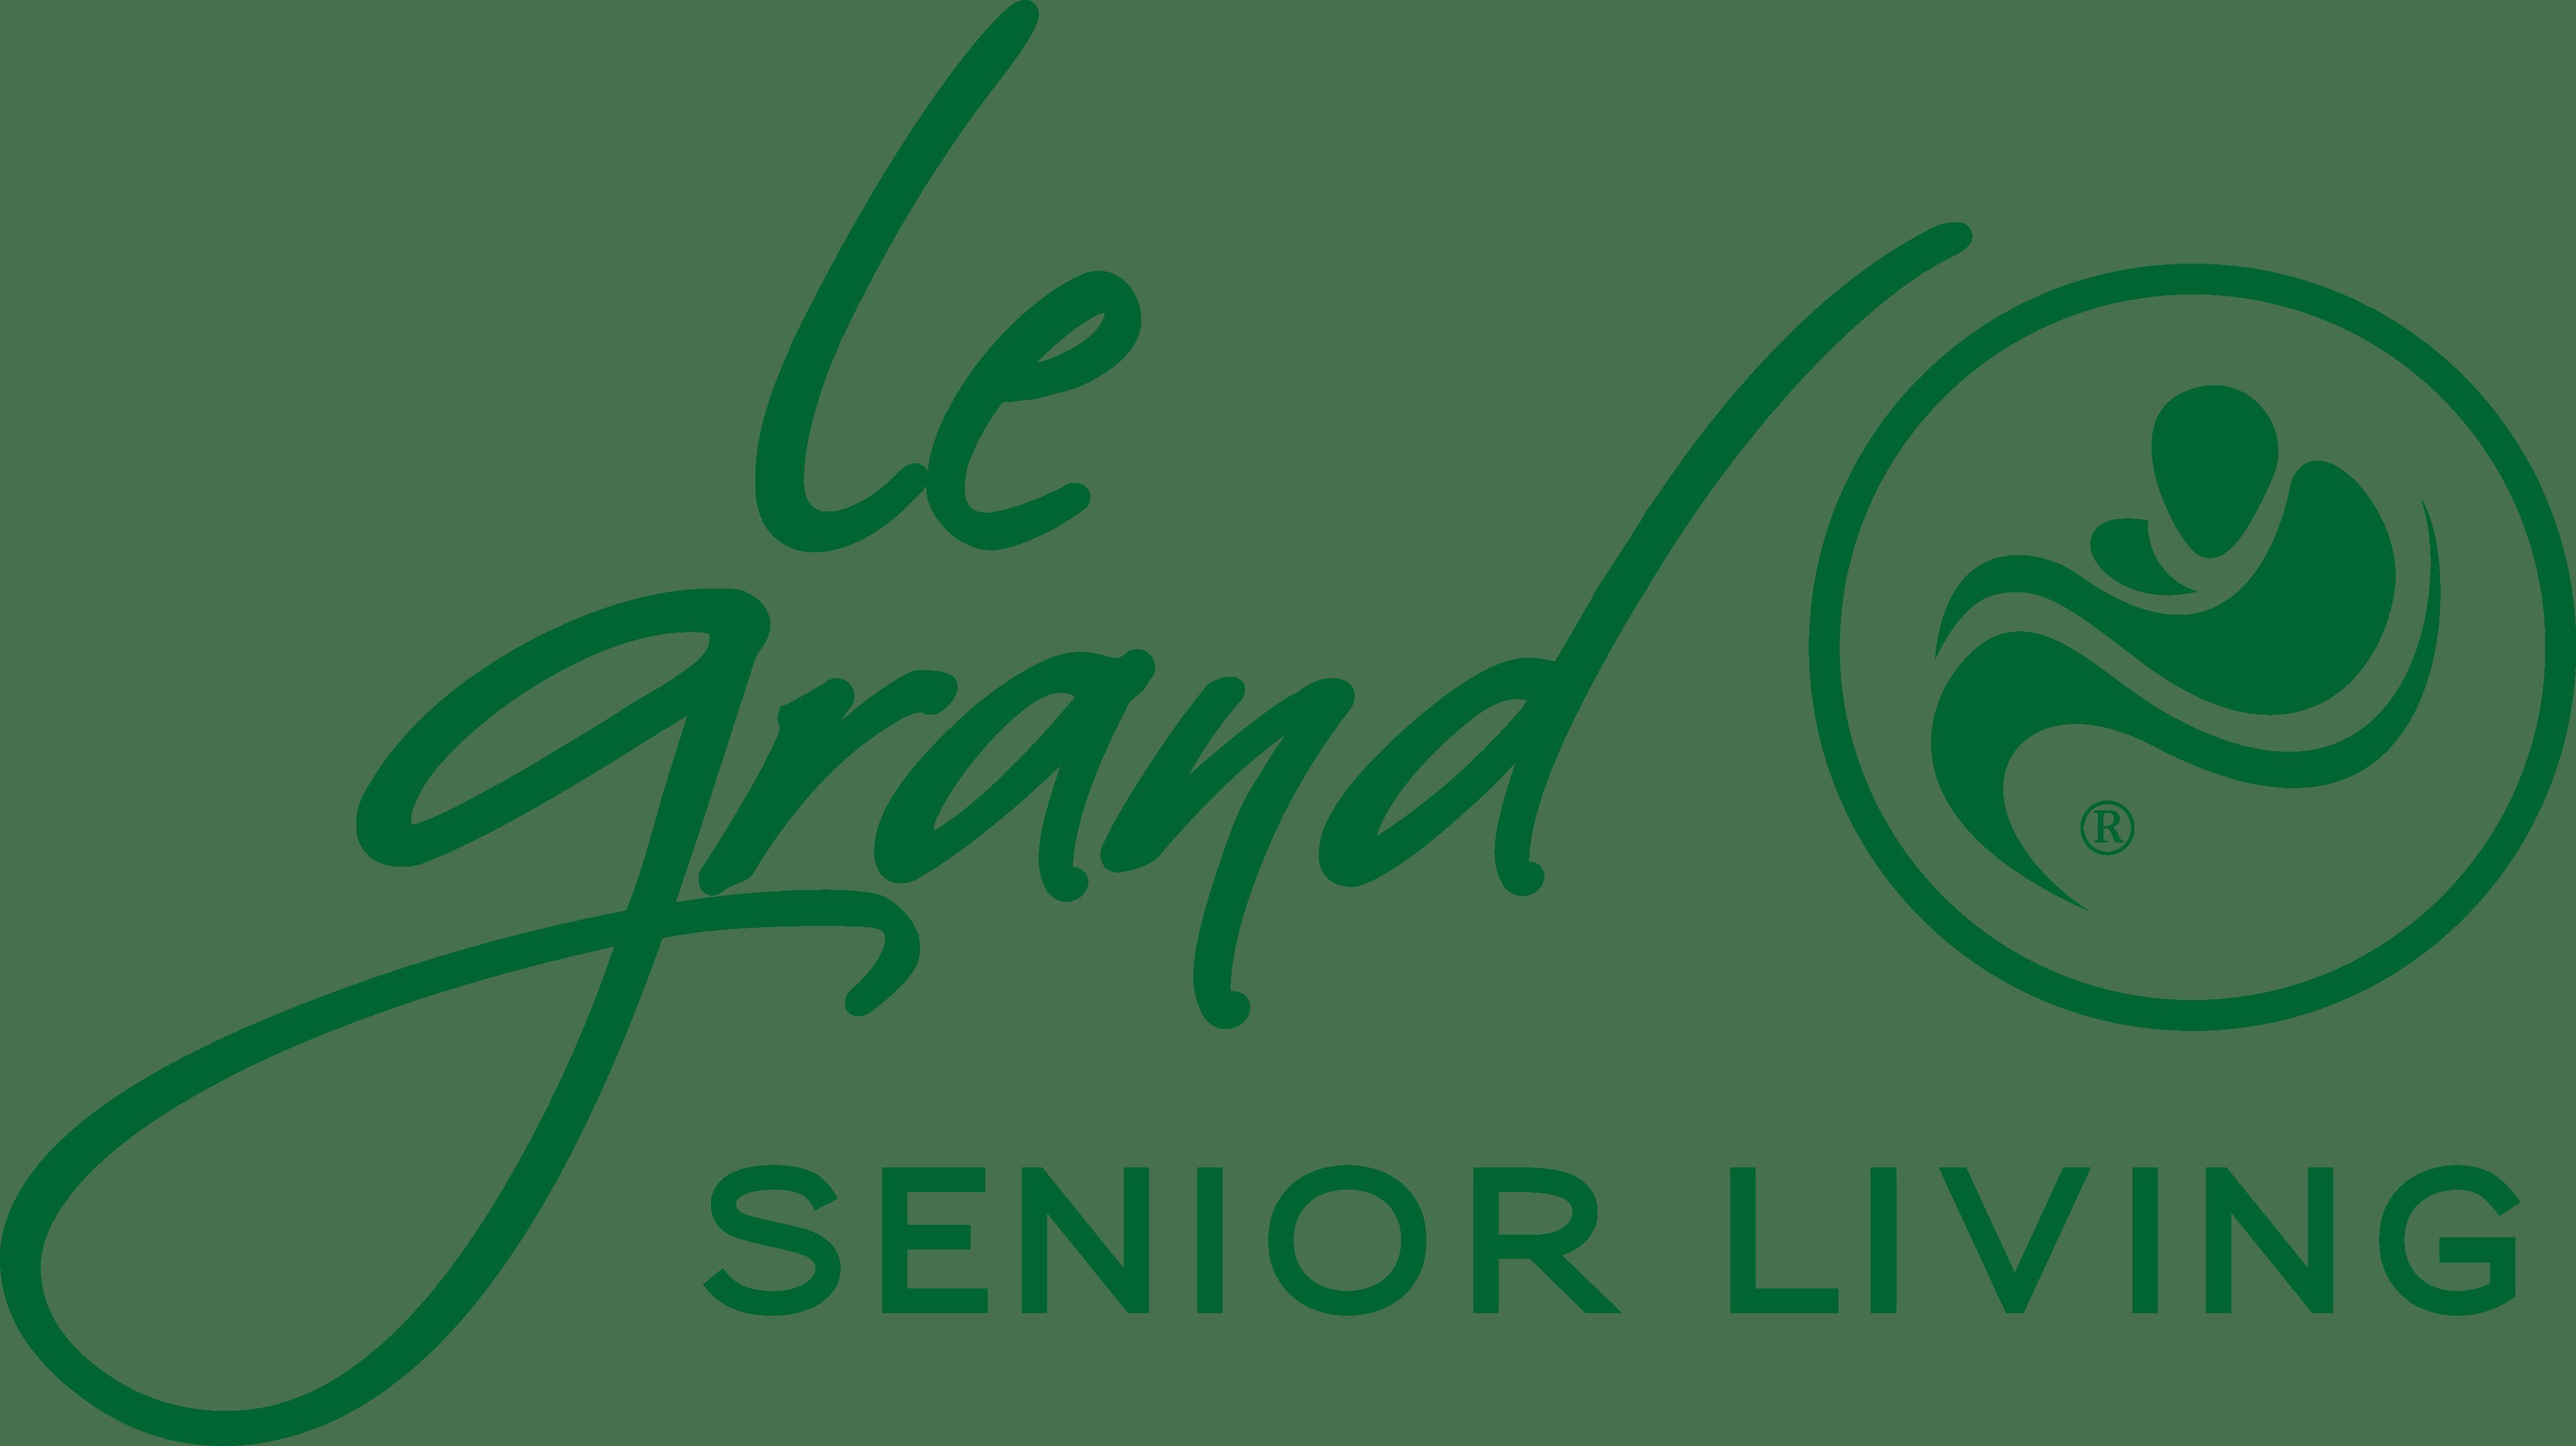 Le Grand Senior Living